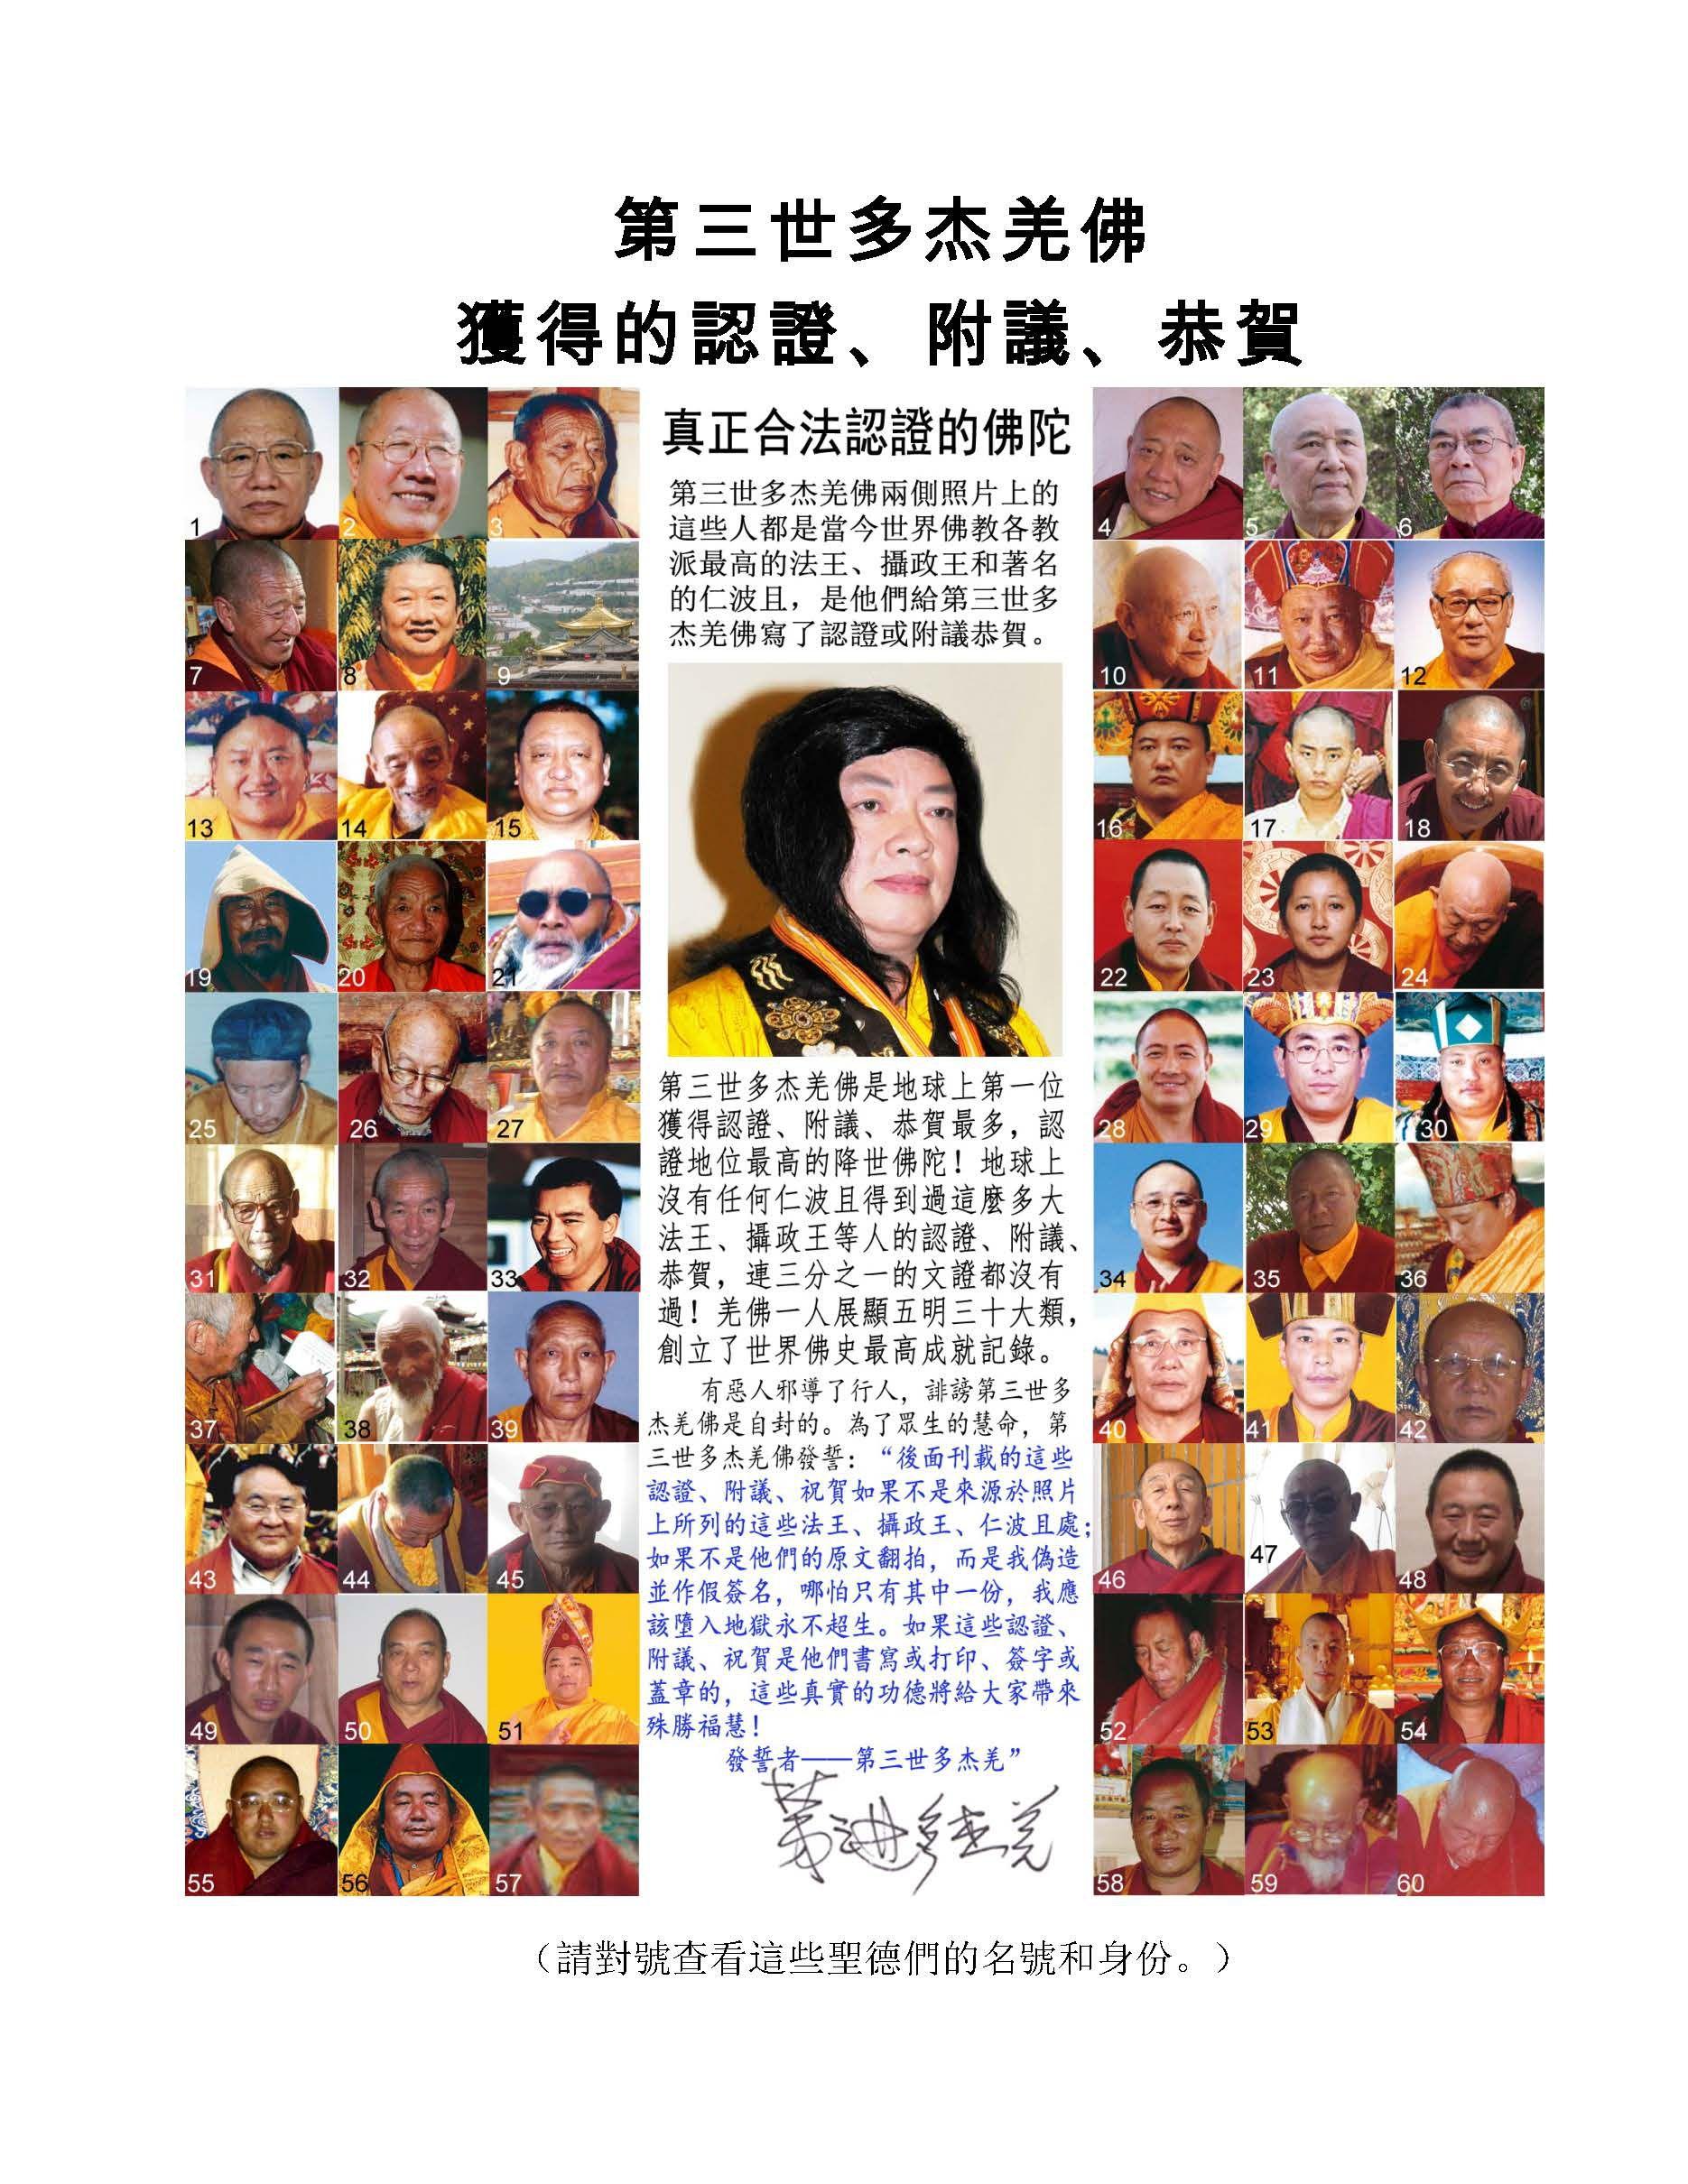 「H.H.第三世多杰羌佛系列報導」 H.H.第三世多杰羌佛在人間